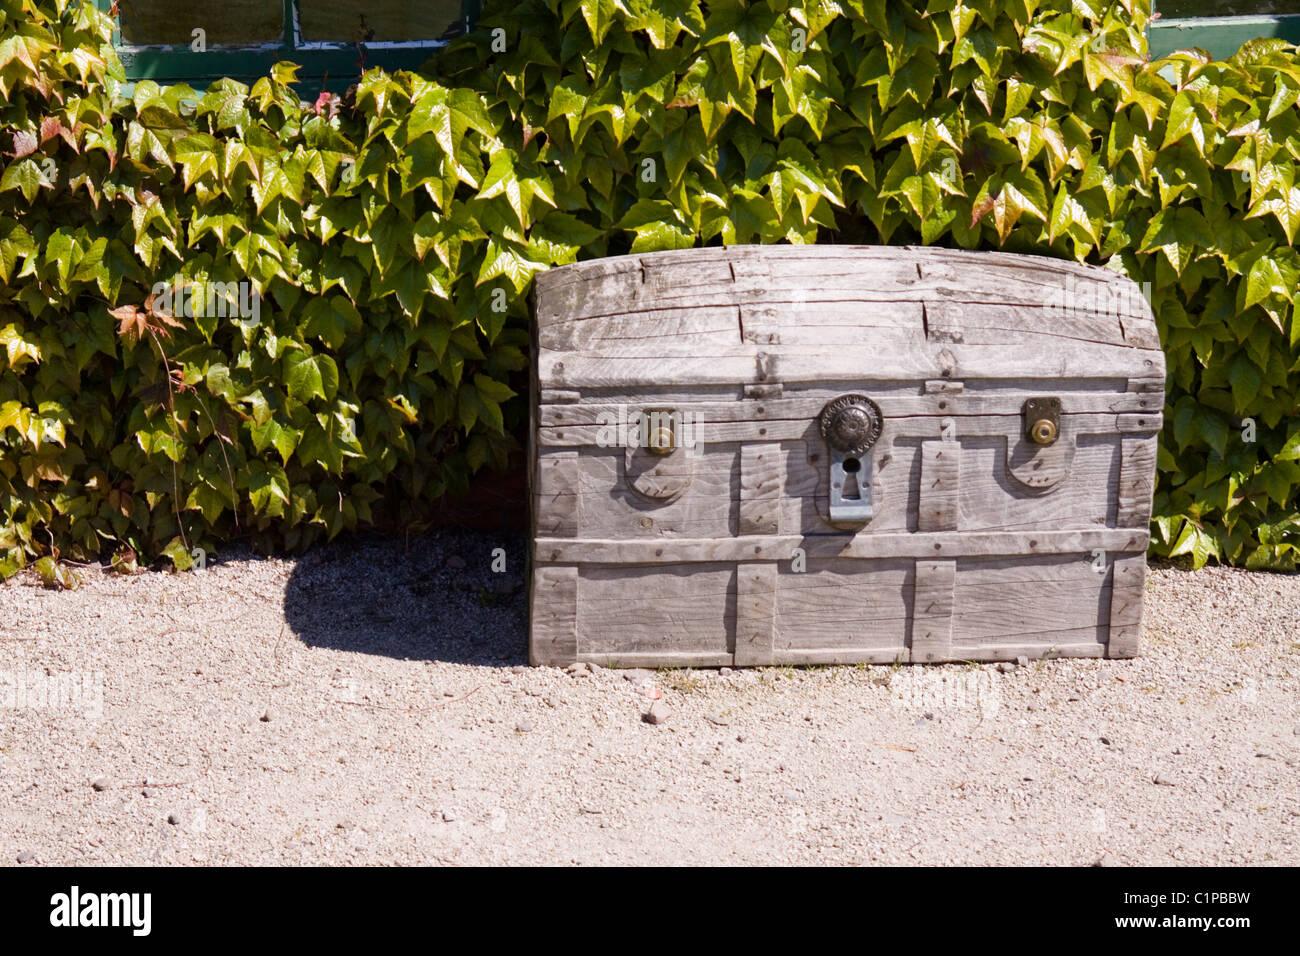 Scotland, Perthshire, Kirriemuir, old wooden trunk in Peter Pan garden - Stock Image